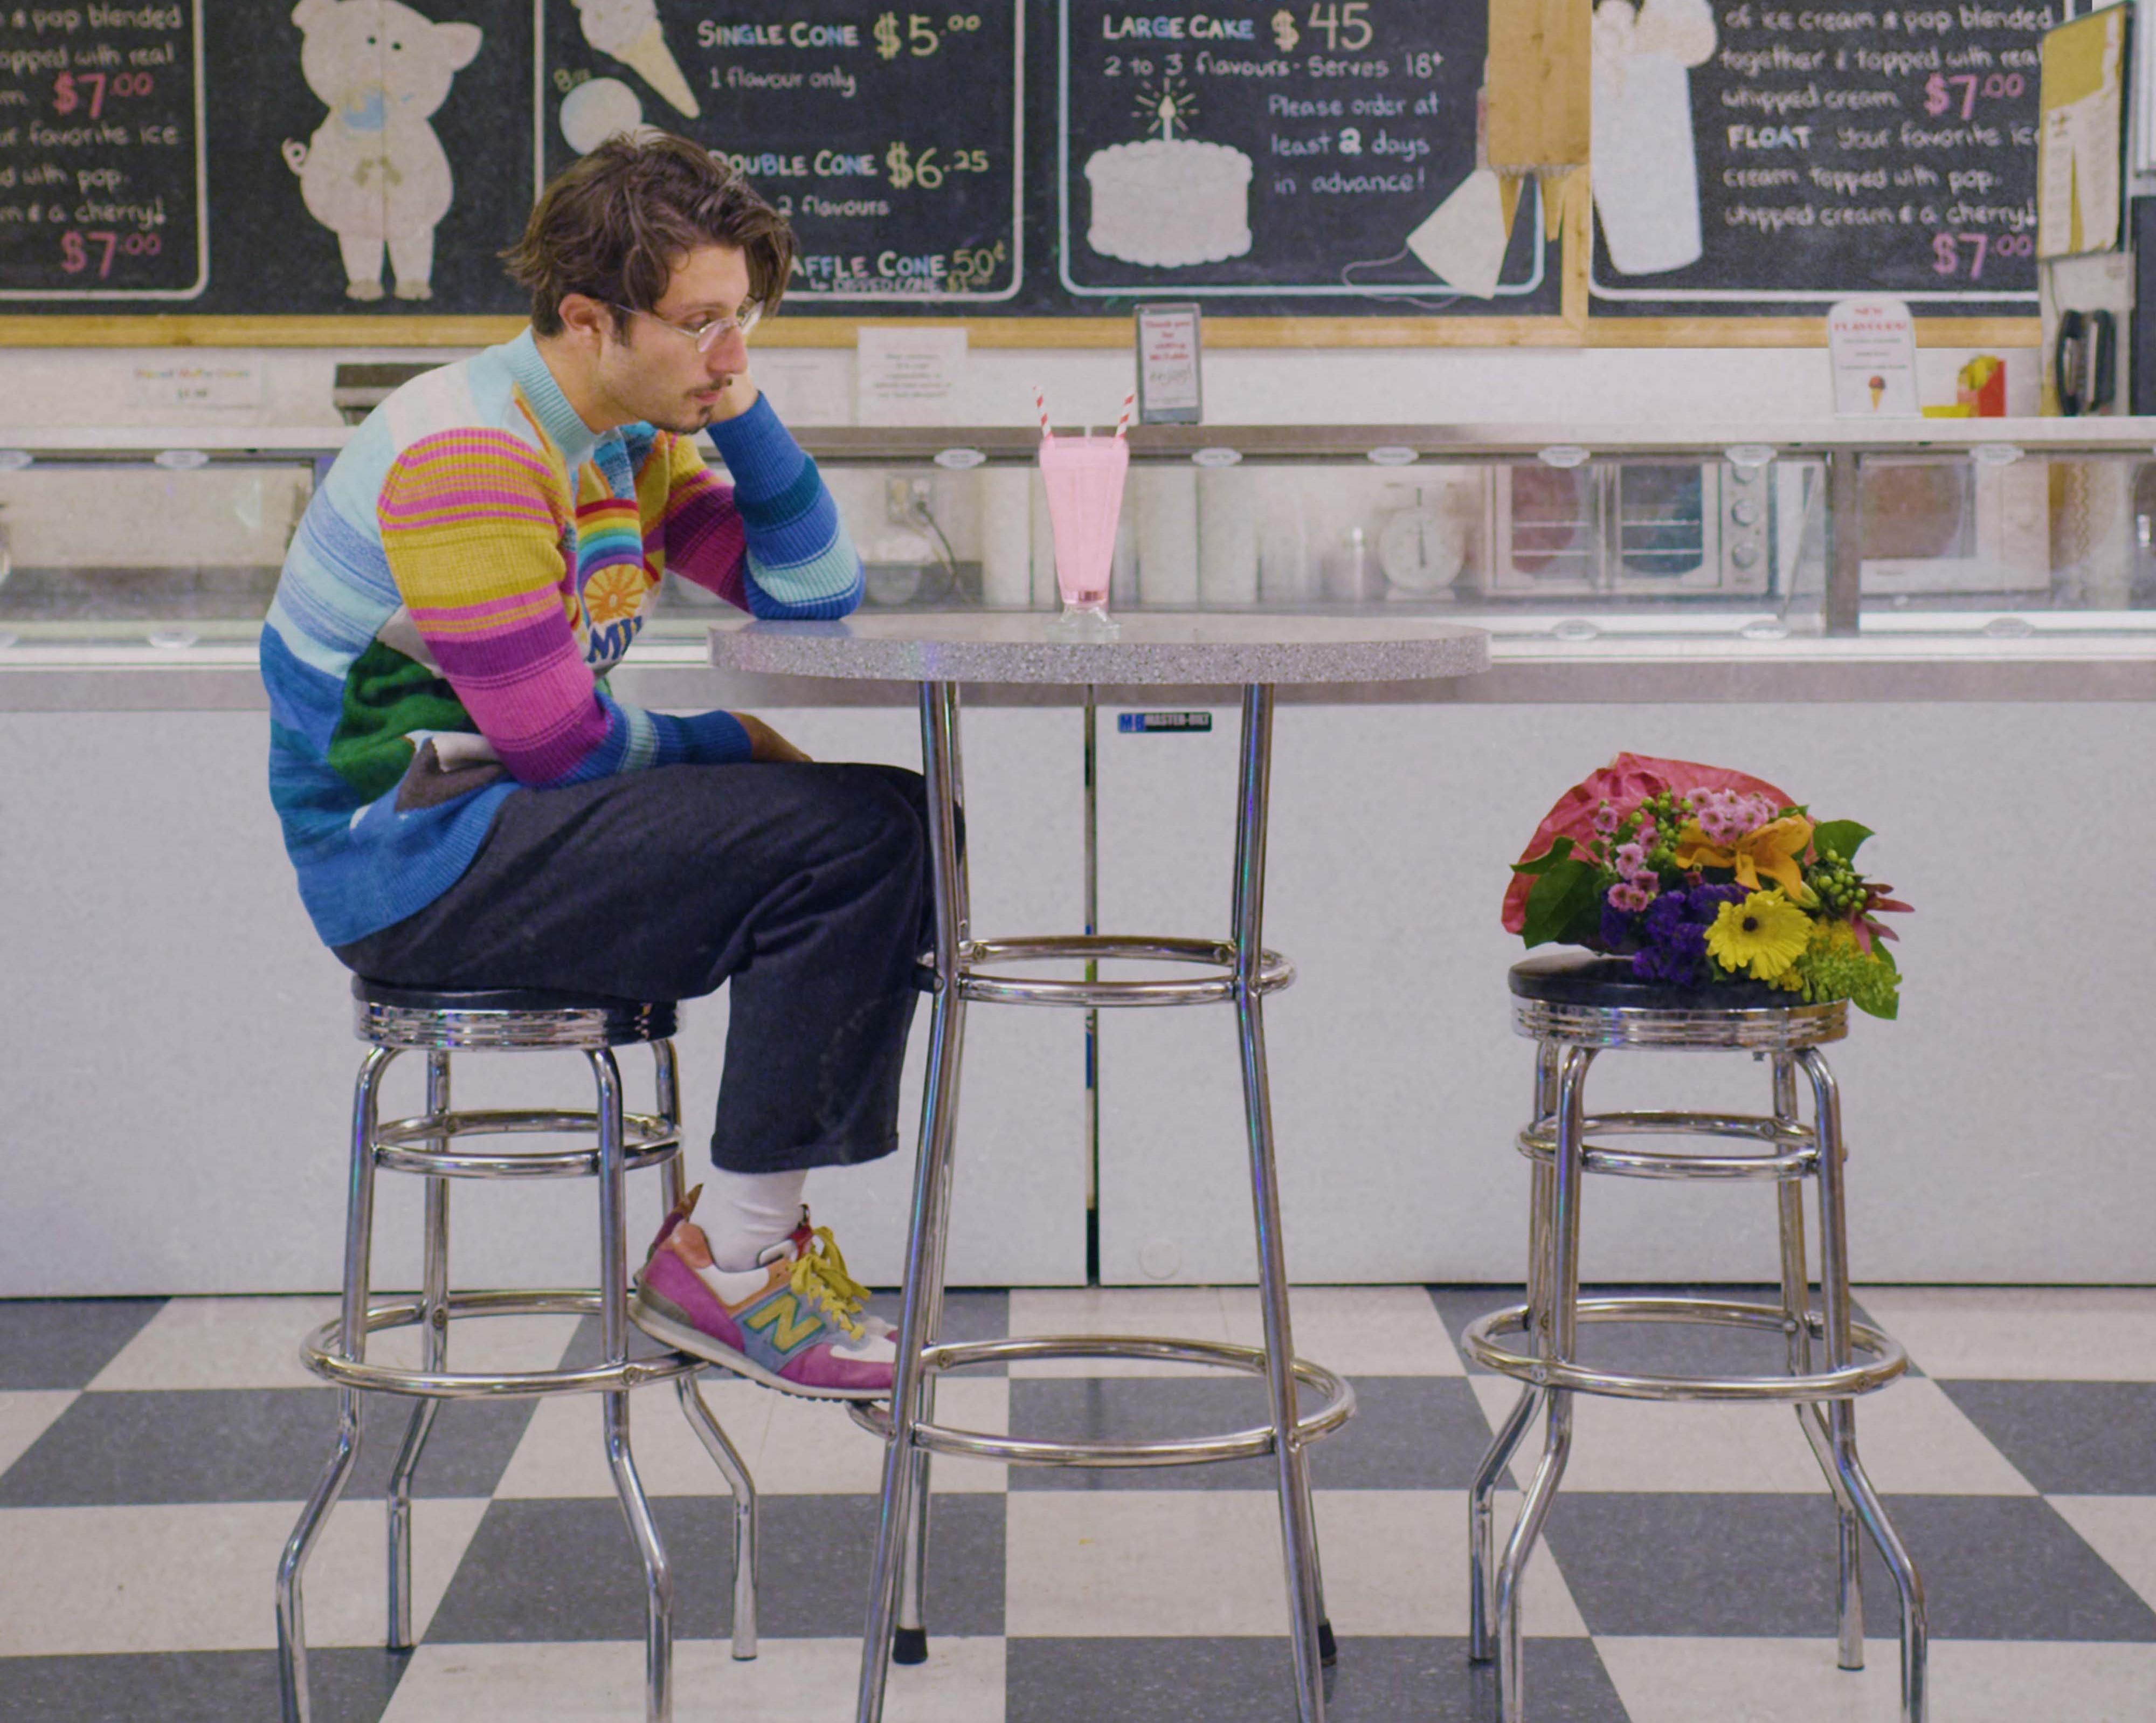 bbno$ Announces New Album 'Eat Ya Veggies'  Out October 8